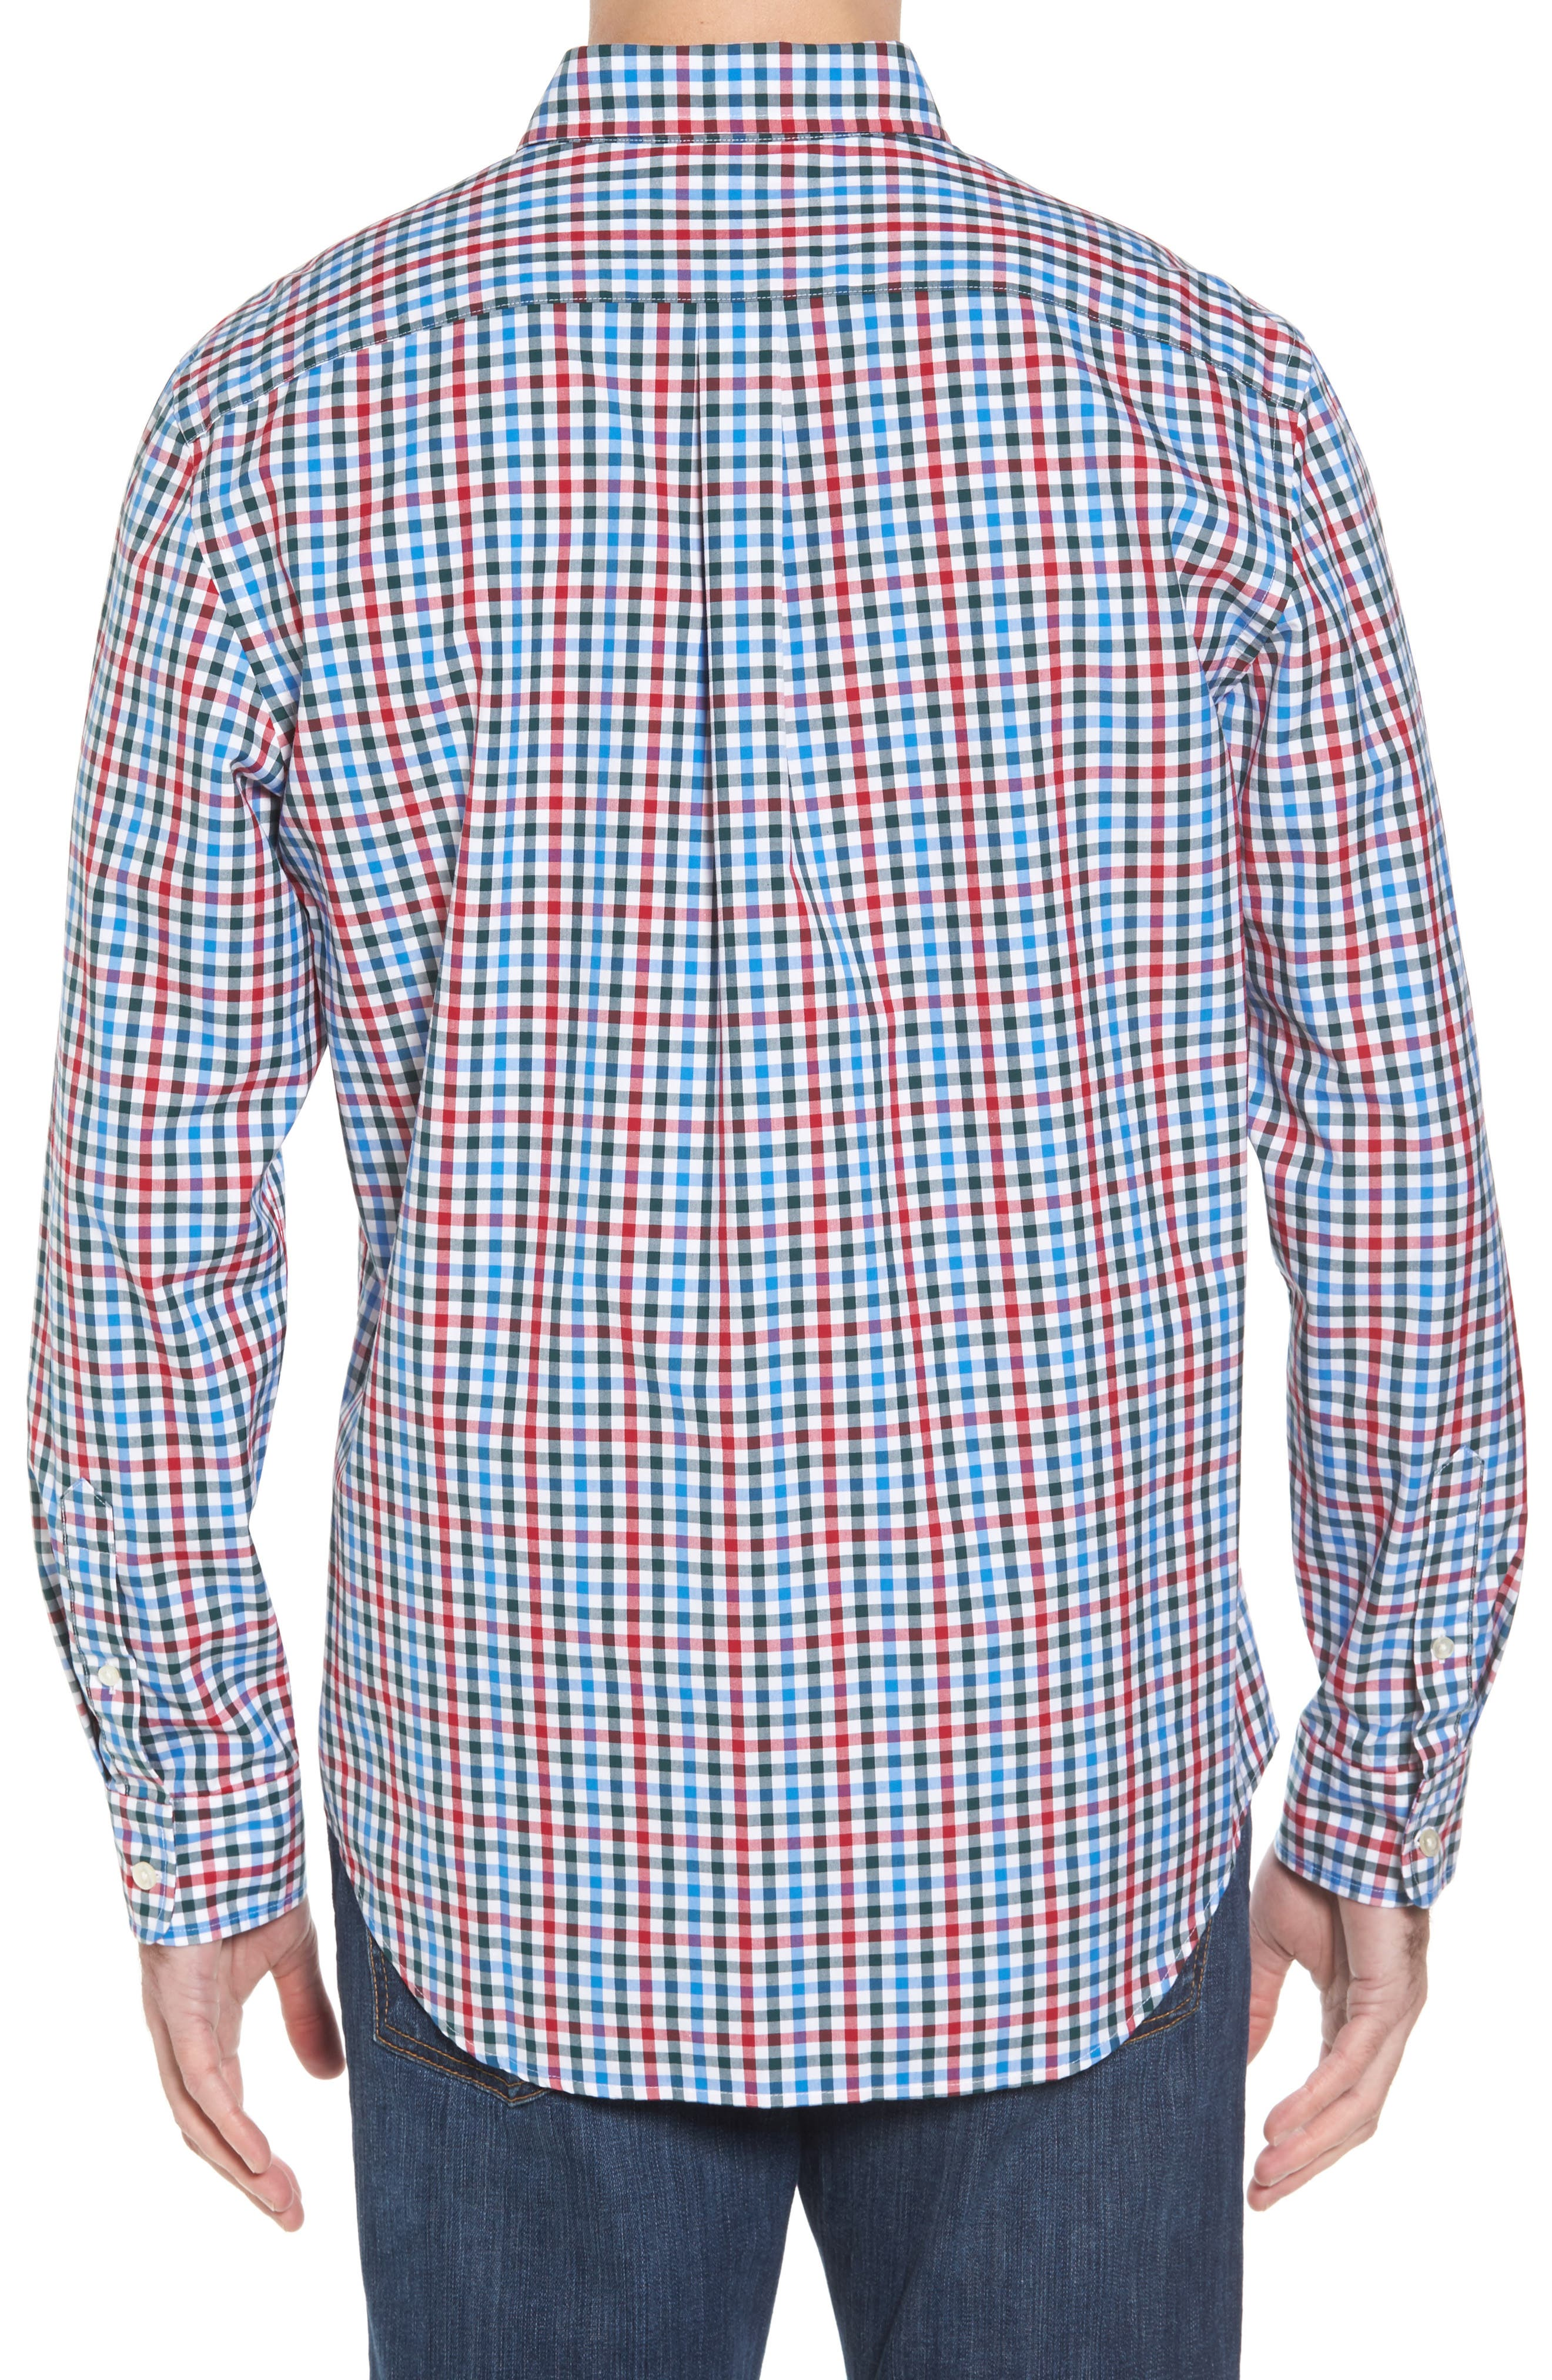 Higgins Beach Classic Fit Gingham Sport Shirt,                             Alternate thumbnail 2, color,                             620